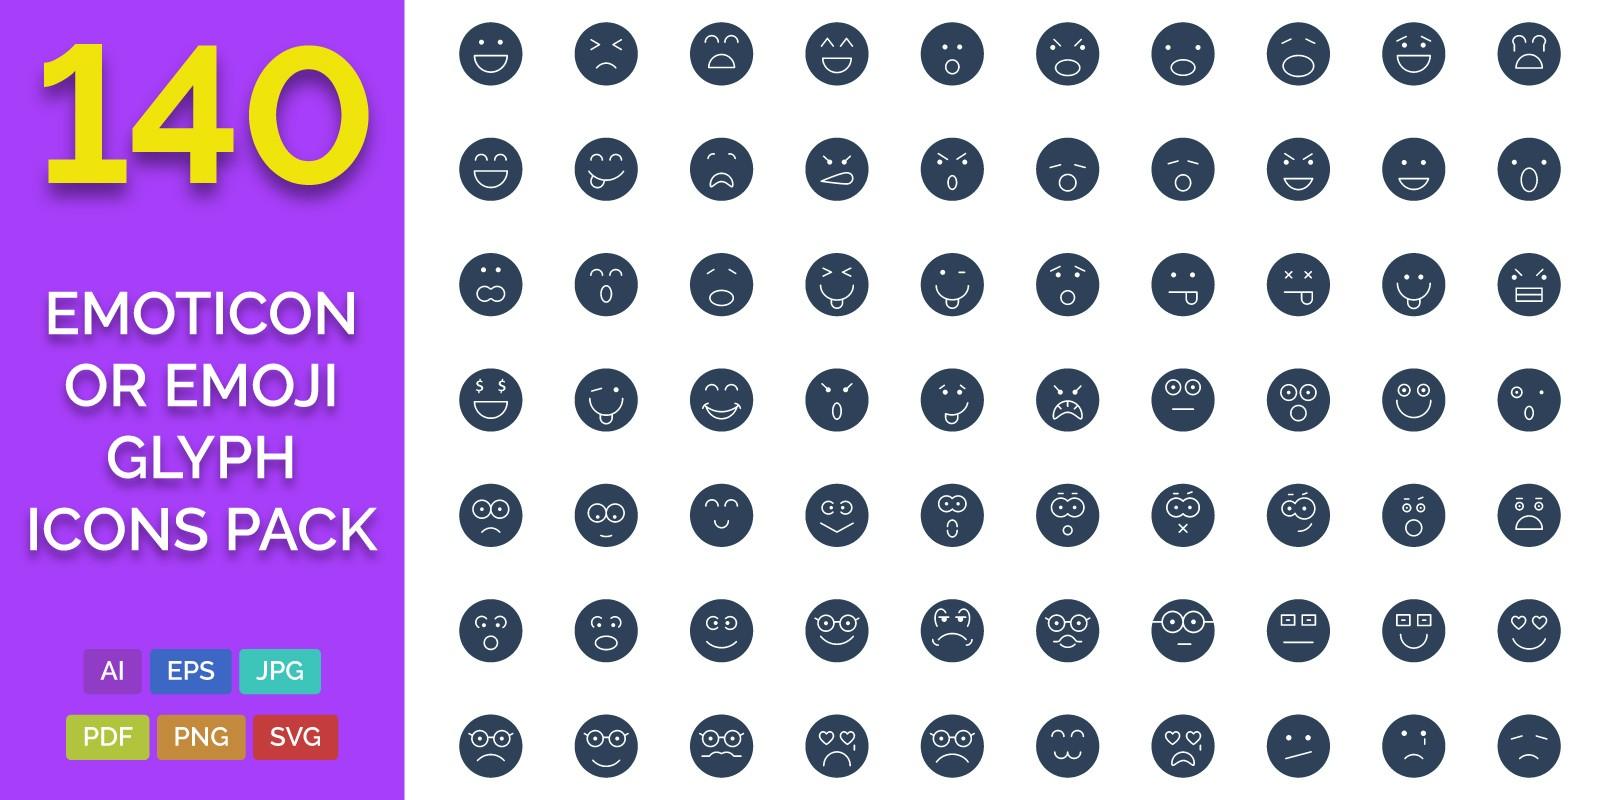 140 Emoticon or Emoji Glyph Icons Pack